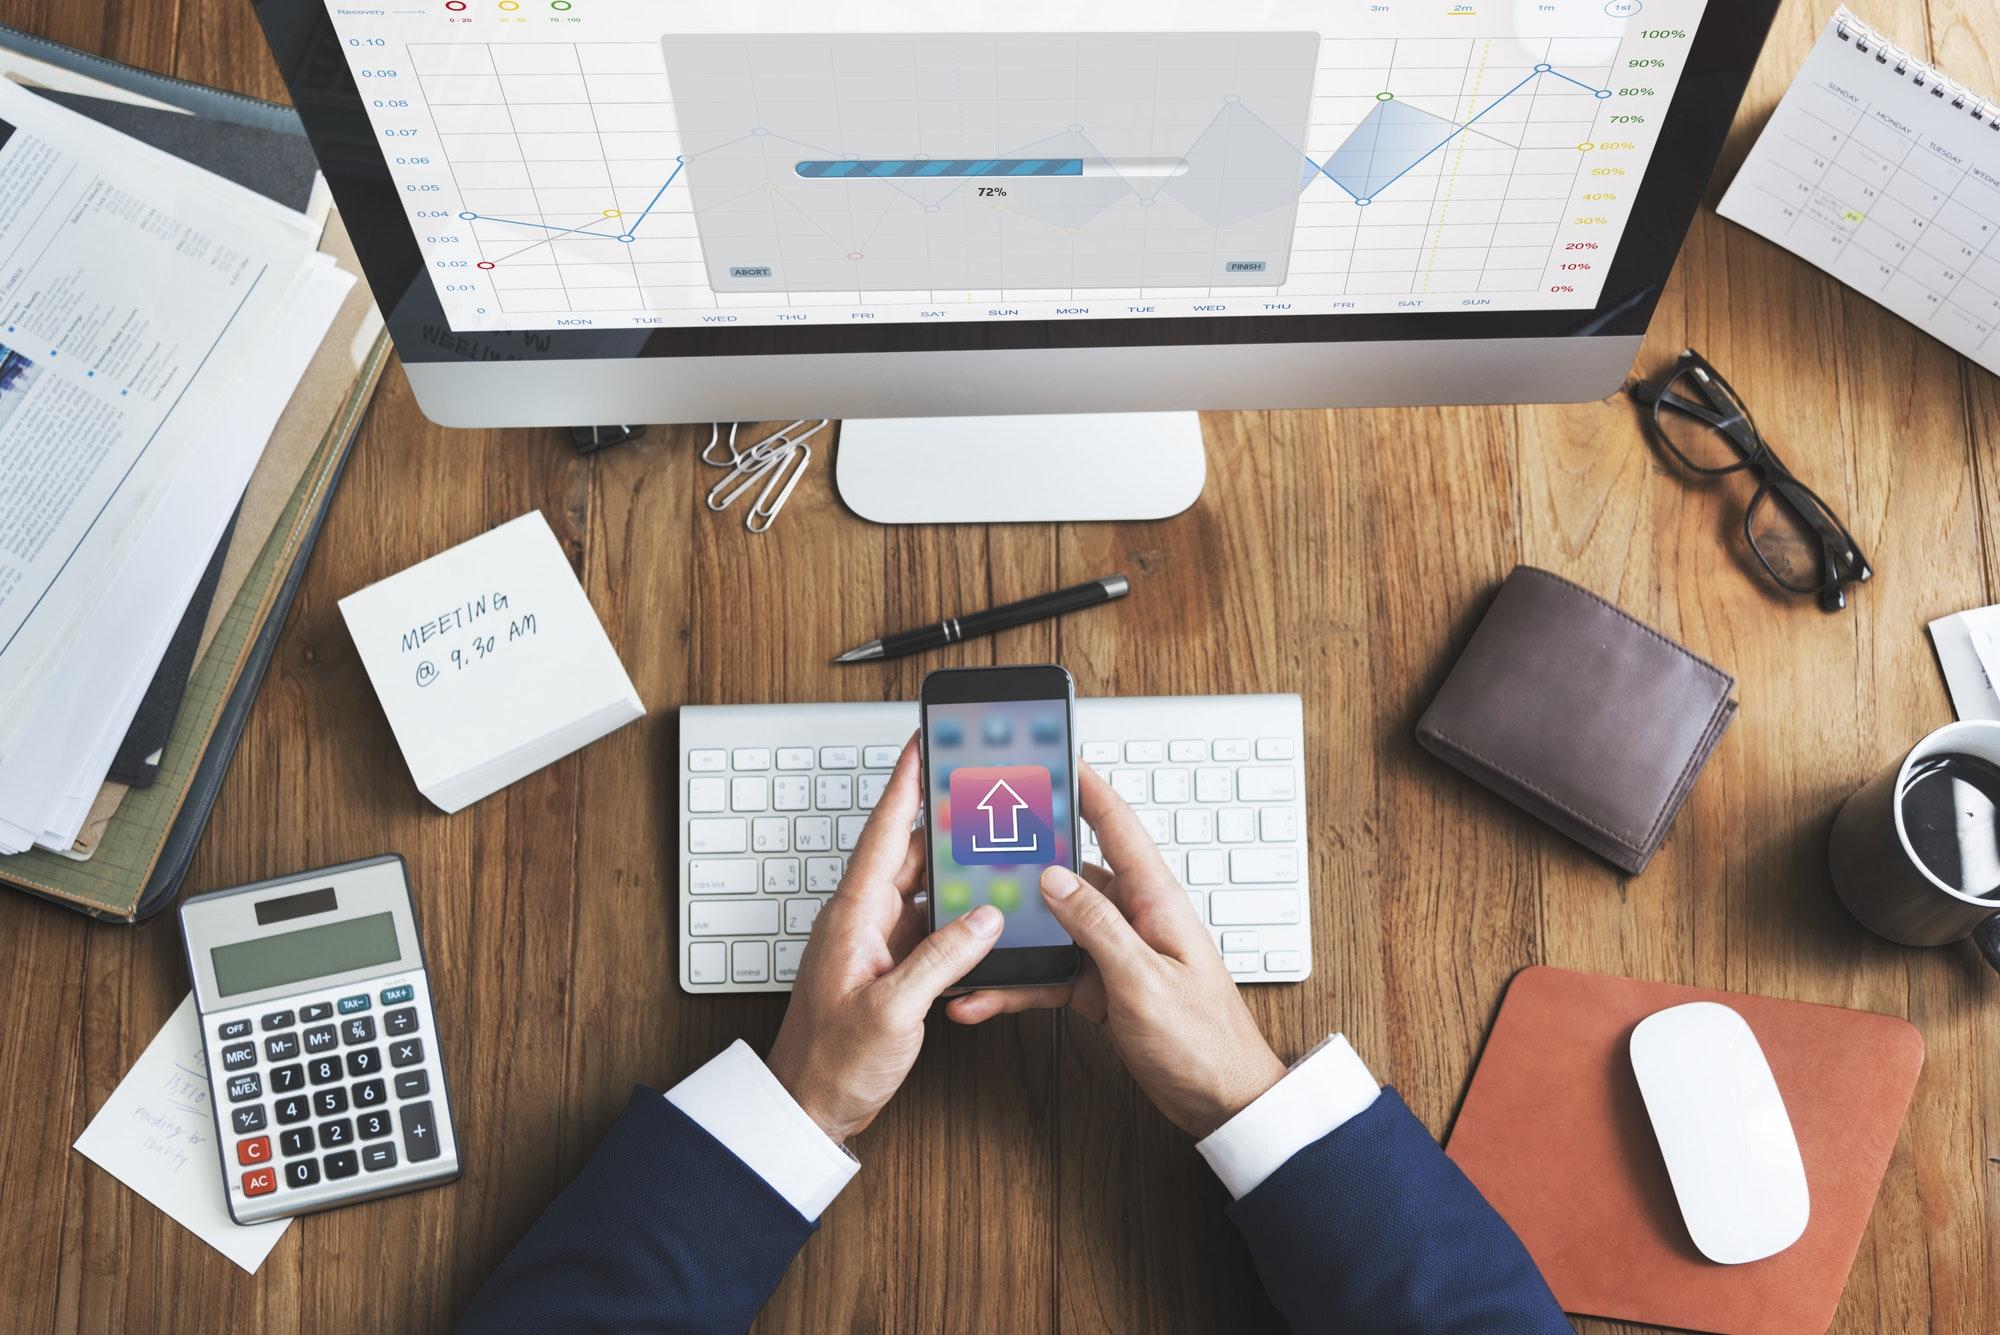 Enviar arquivos grandes: 5 sites para enviar de forma gratuita